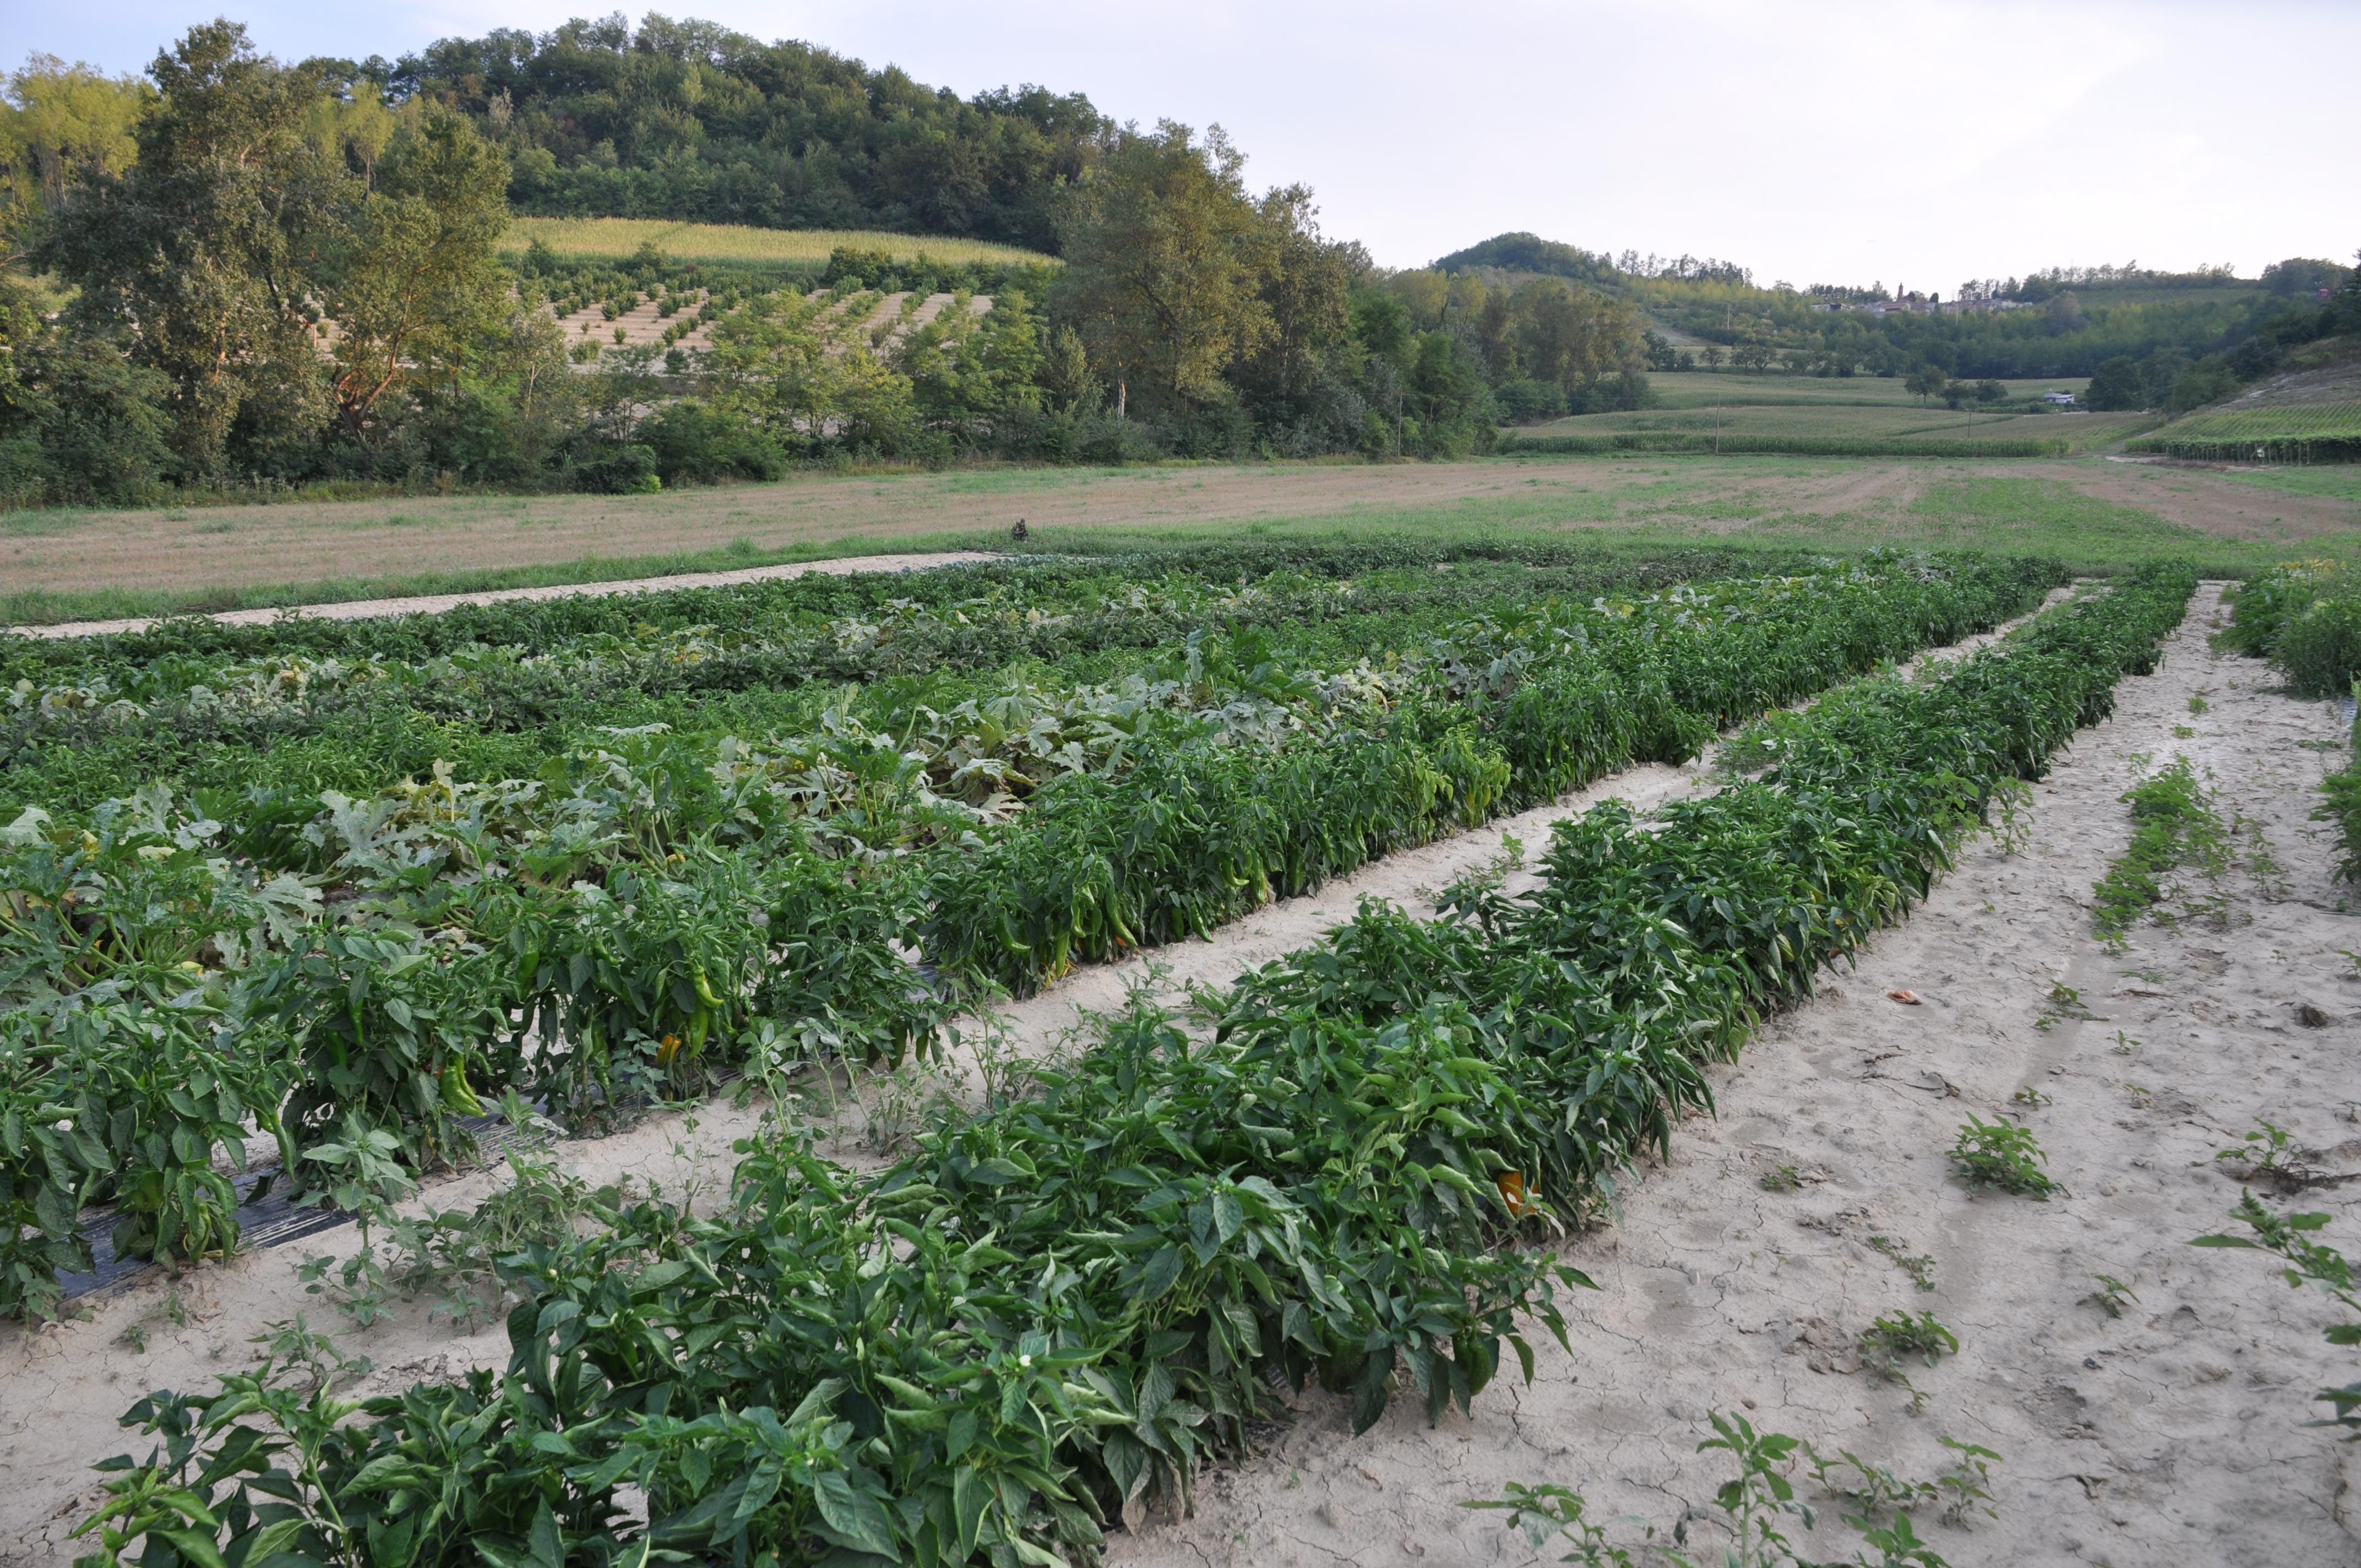 Cuore Verde - Morsasco - Piemonte